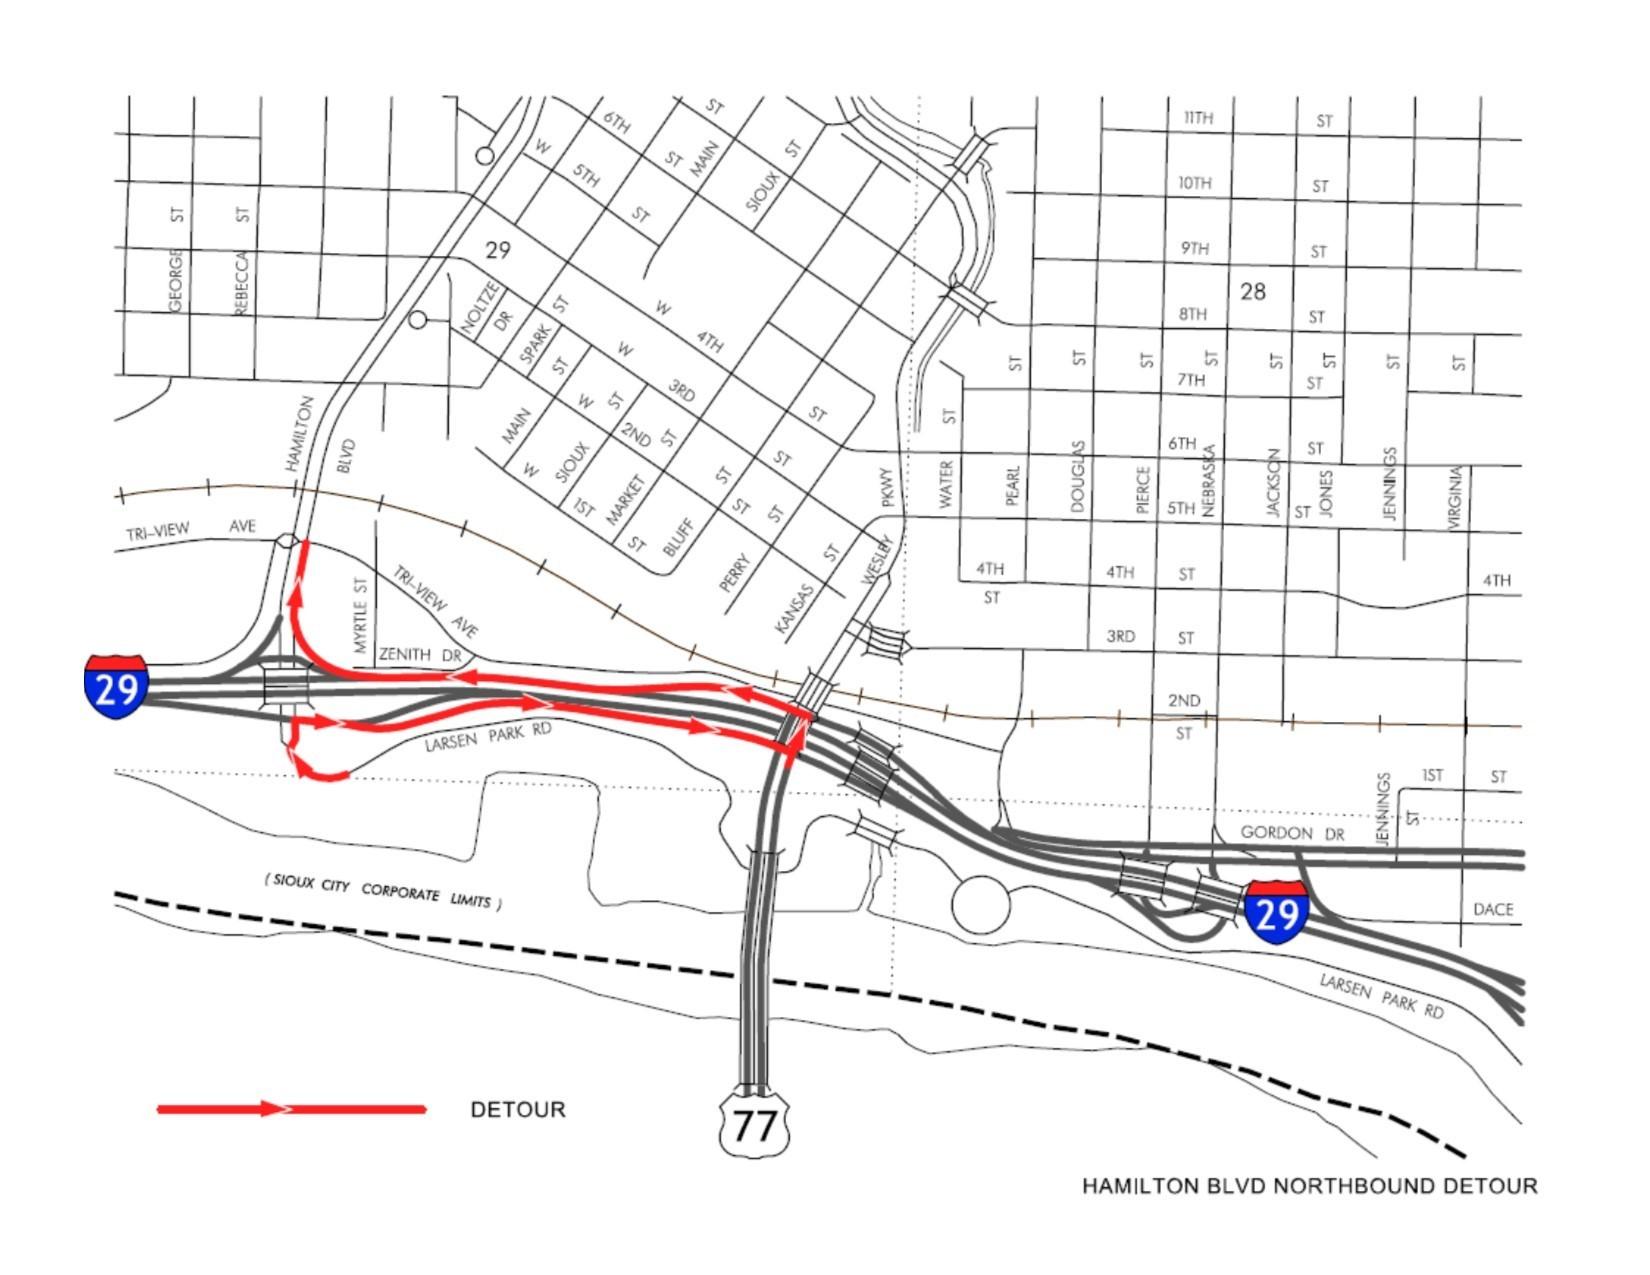 Hamilton Blvd Closure At I 29 News City Of Sioux City Website